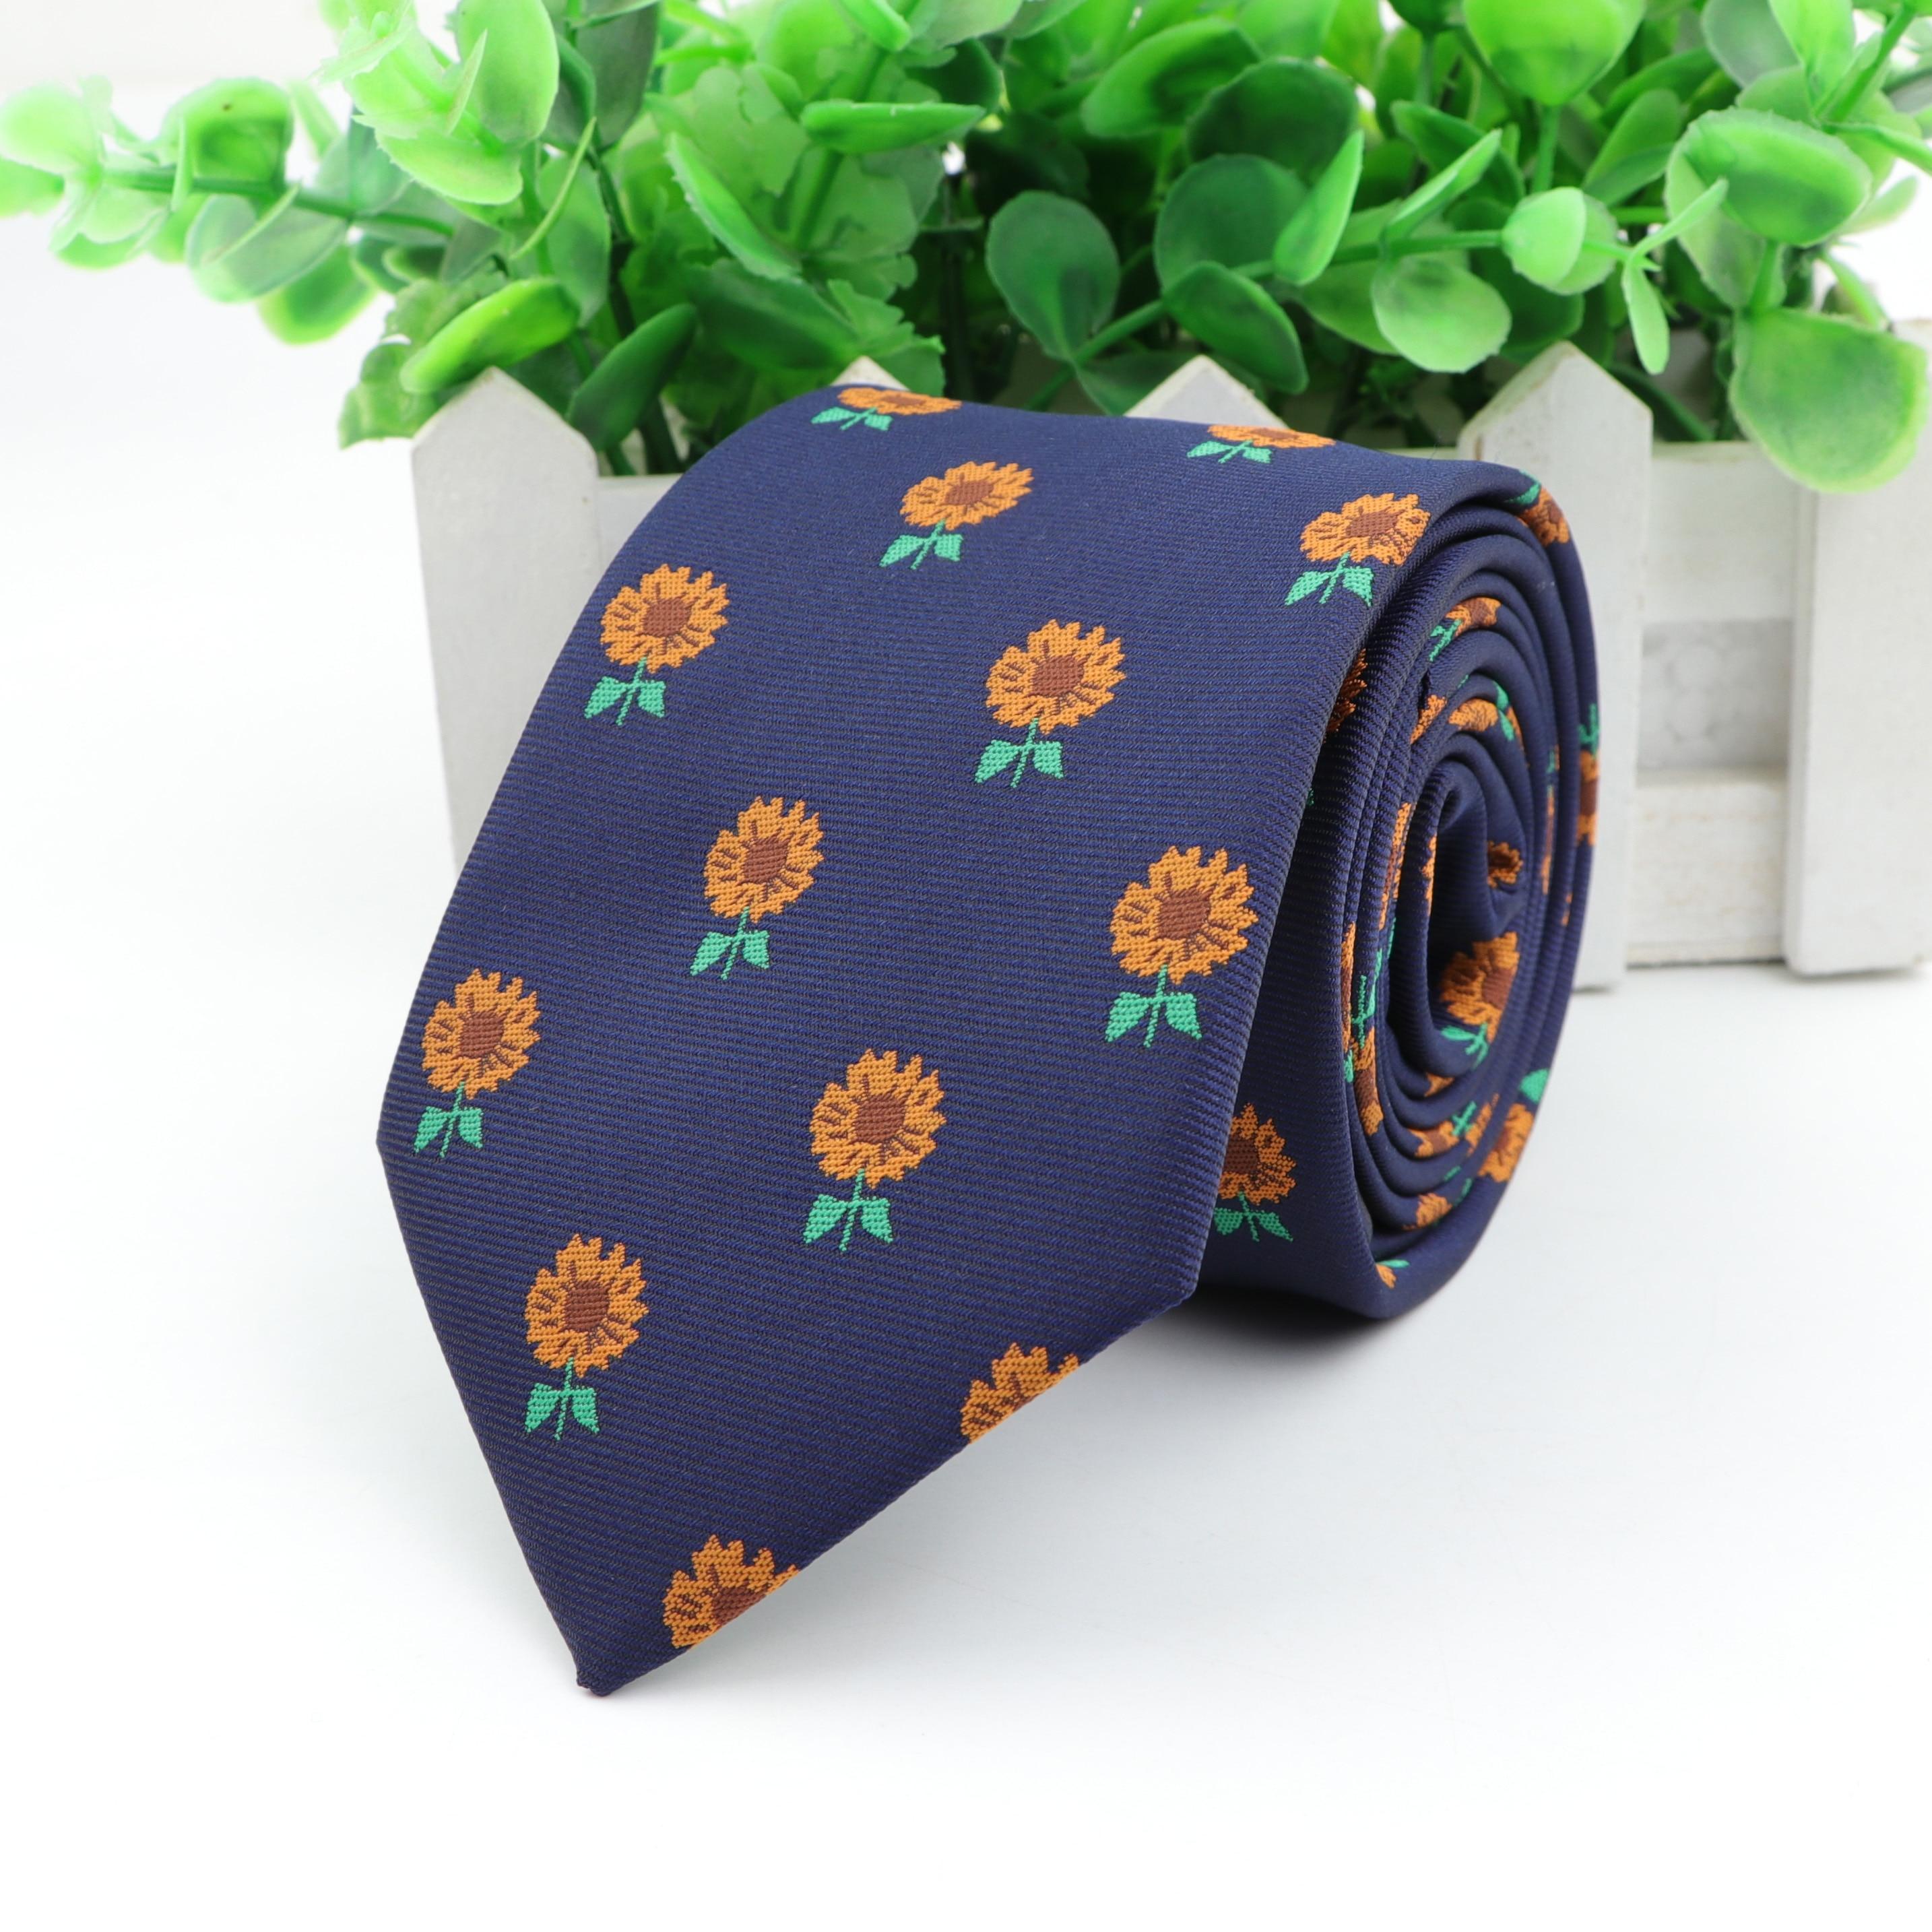 Sunflower Standard Size Necktie Groom Gentleman Ties Men Design Party Polyester Gravata Slim Arrow 7.5cm Silk Tie